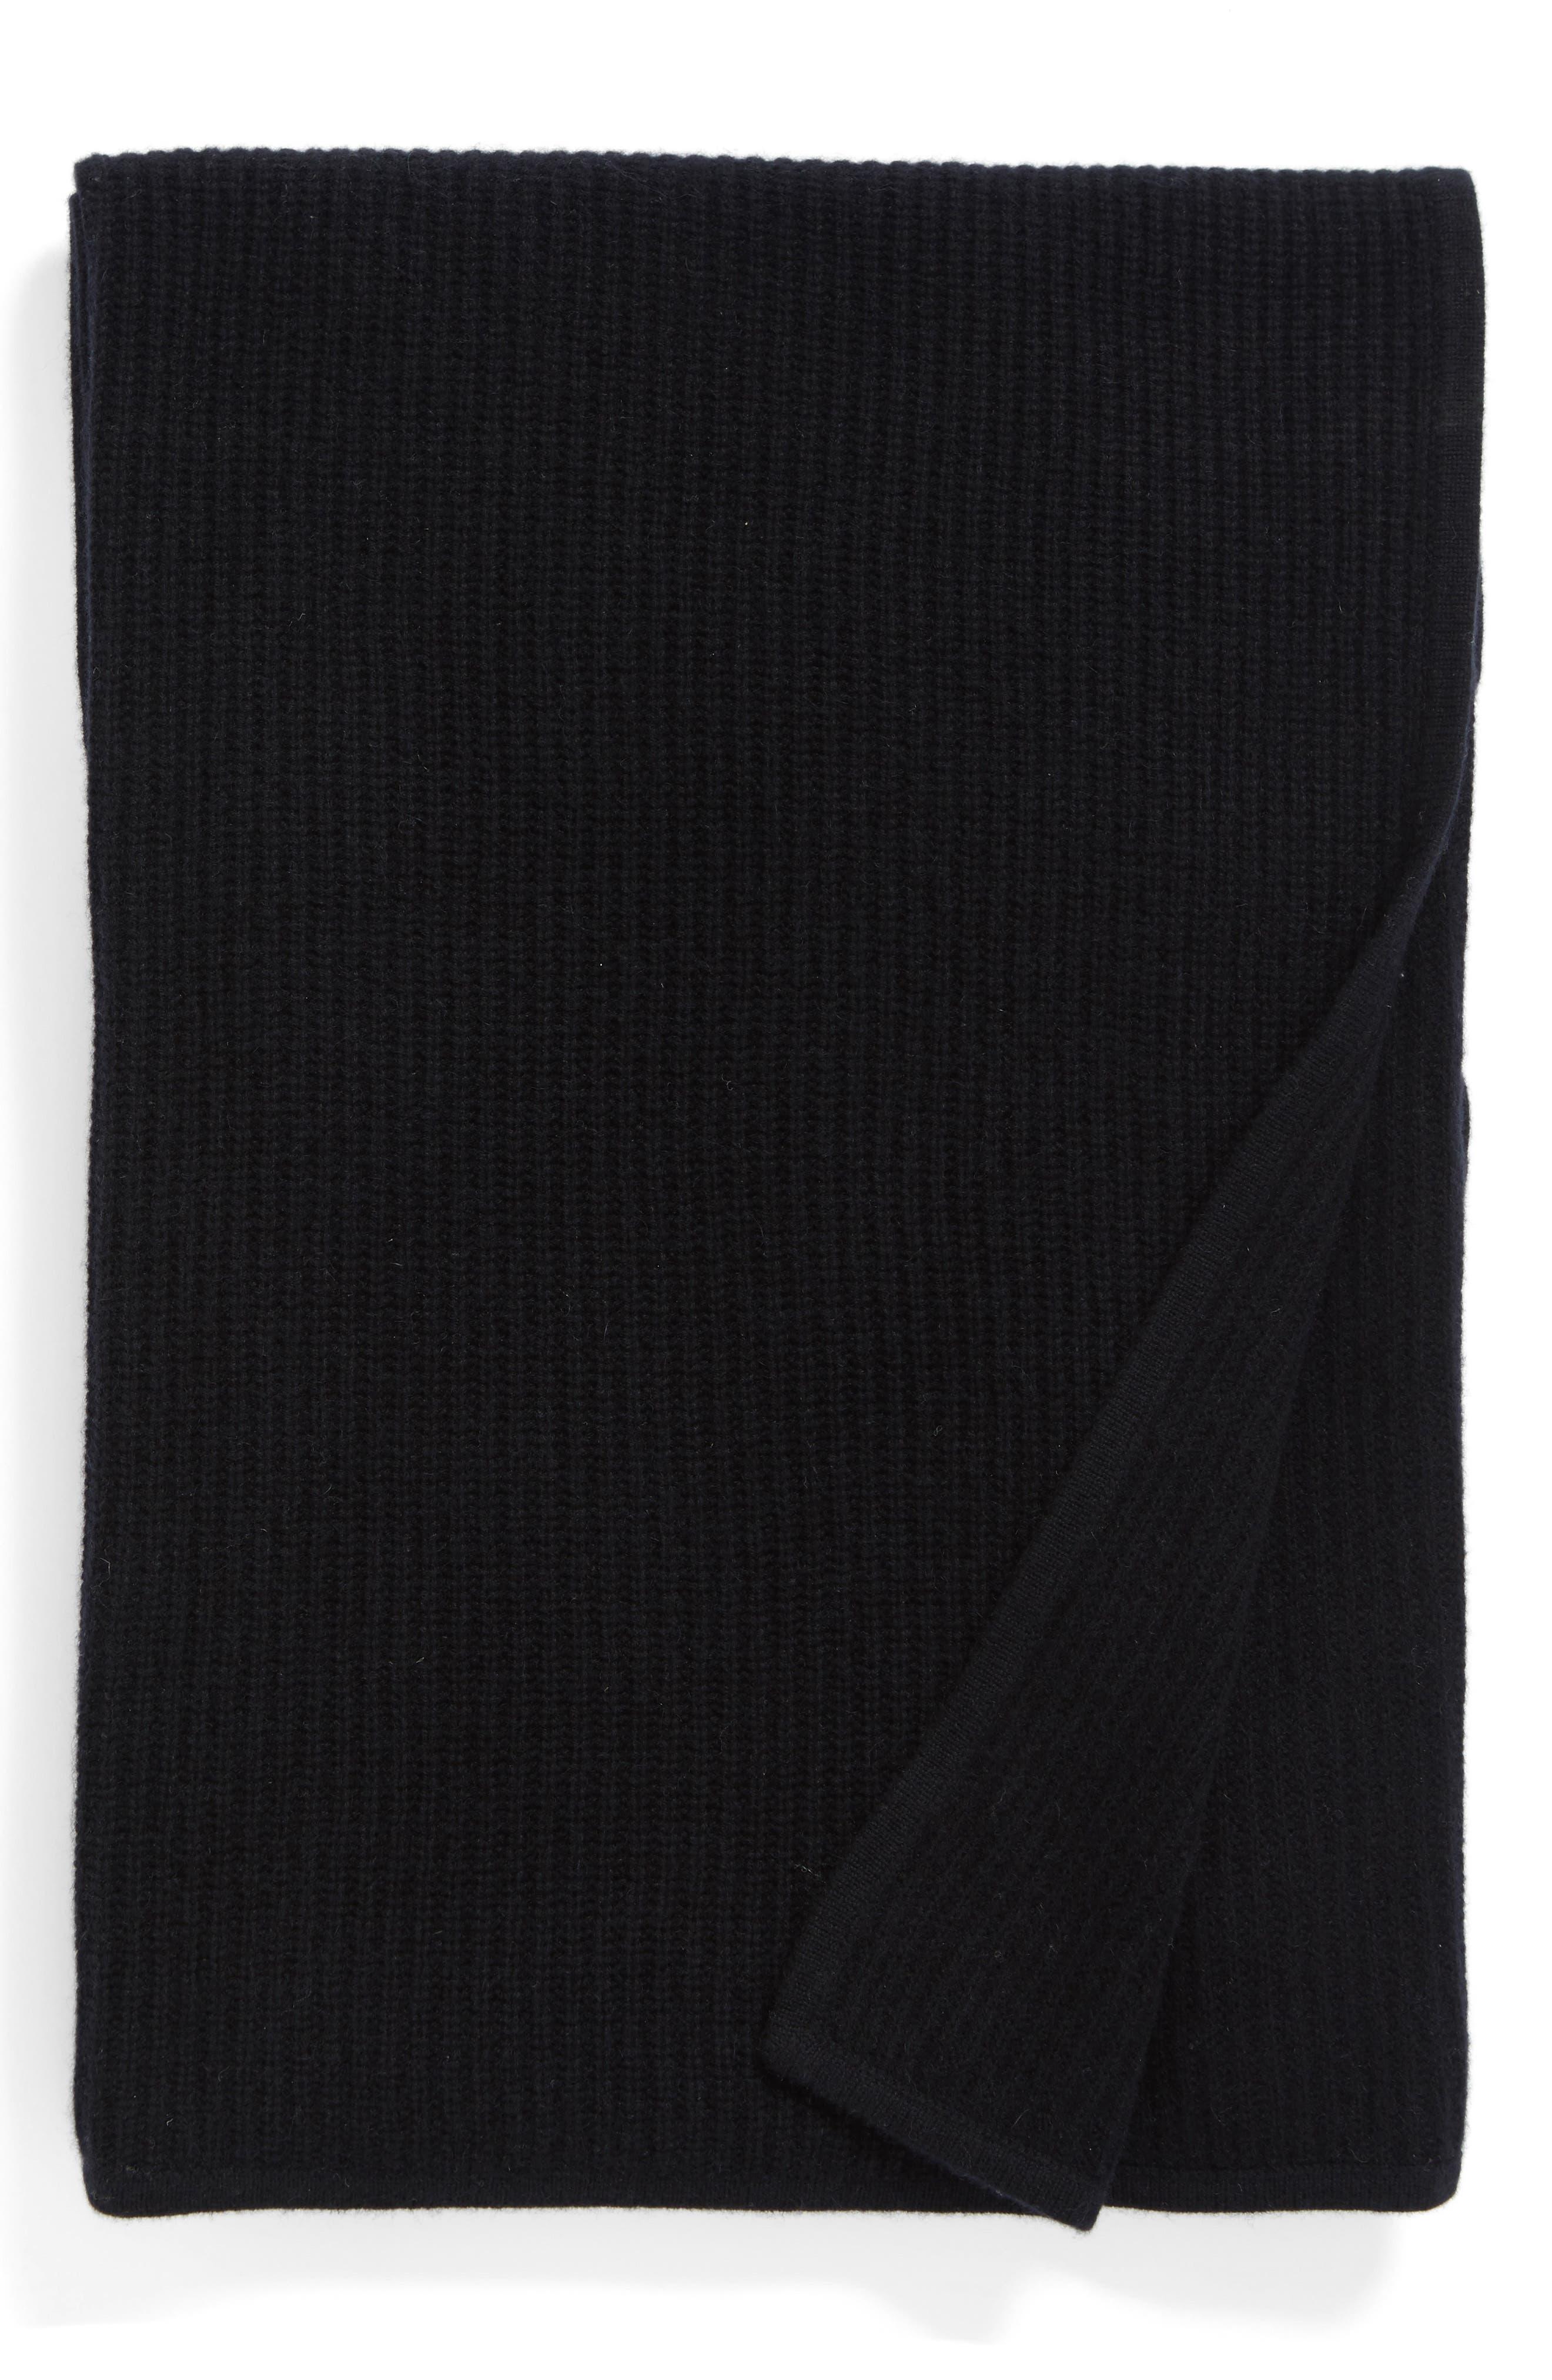 Lattice Cashmere Throw Blanket, Main, color, 001